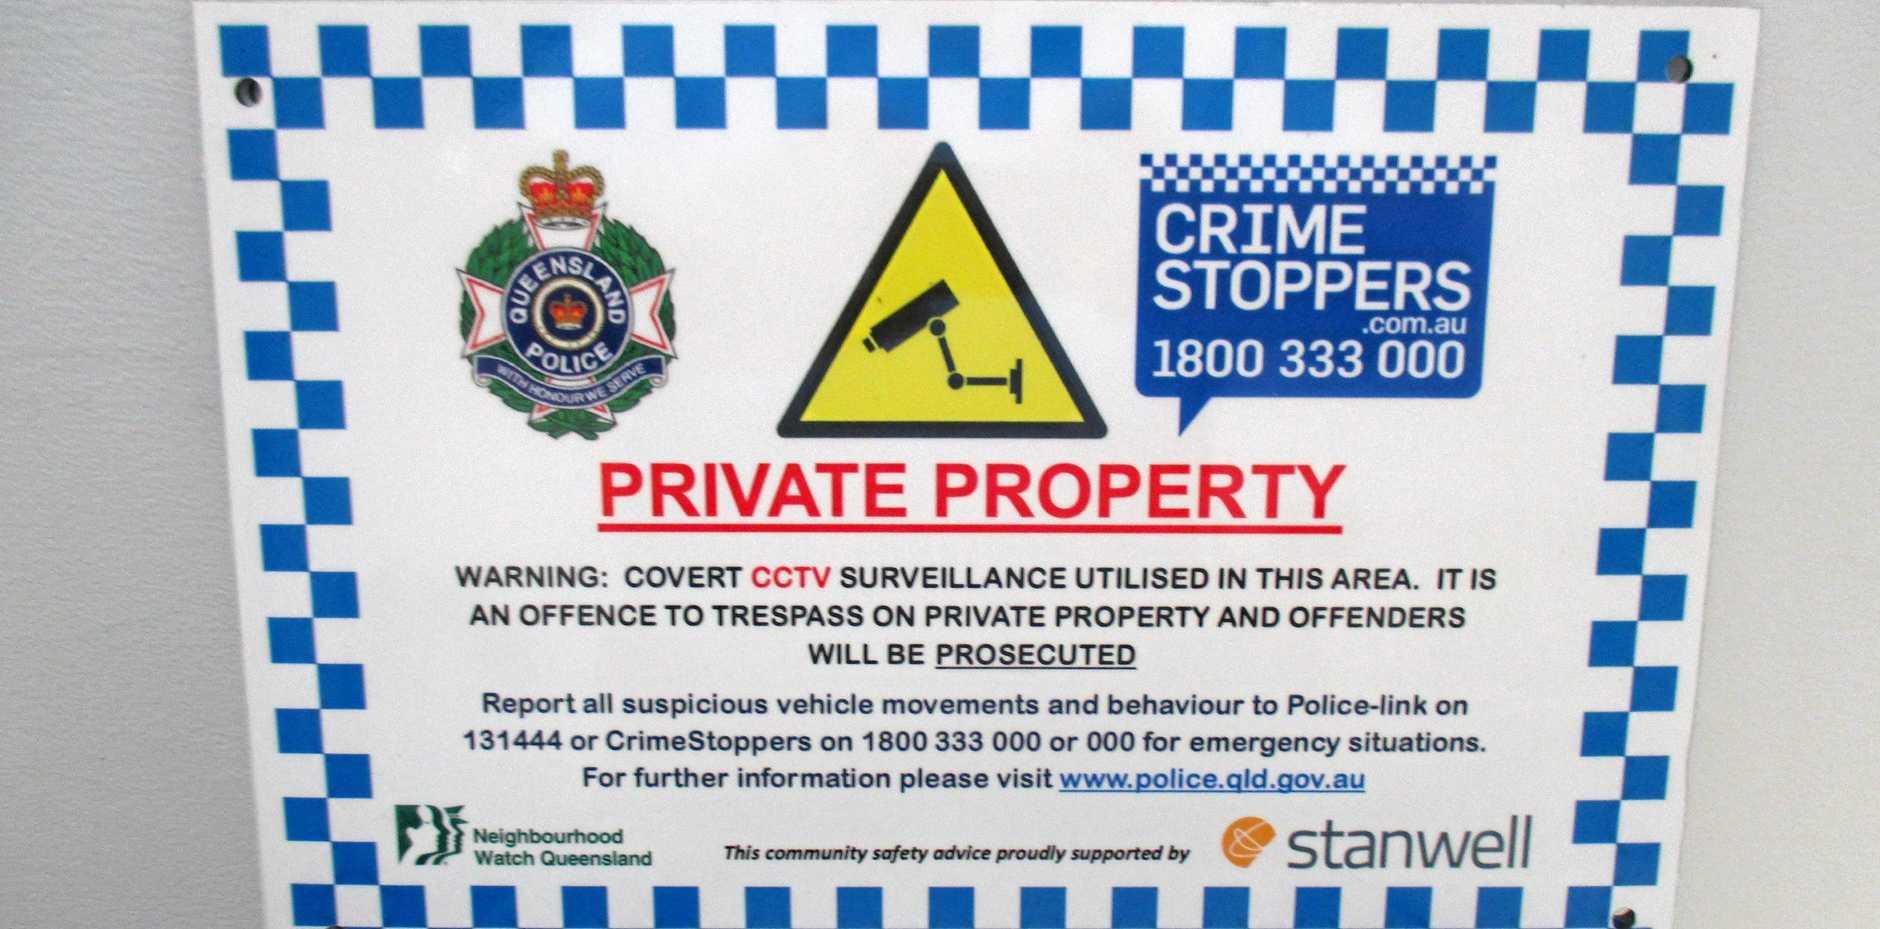 Police signs deter trespassers on rural properties | South Burnett Times